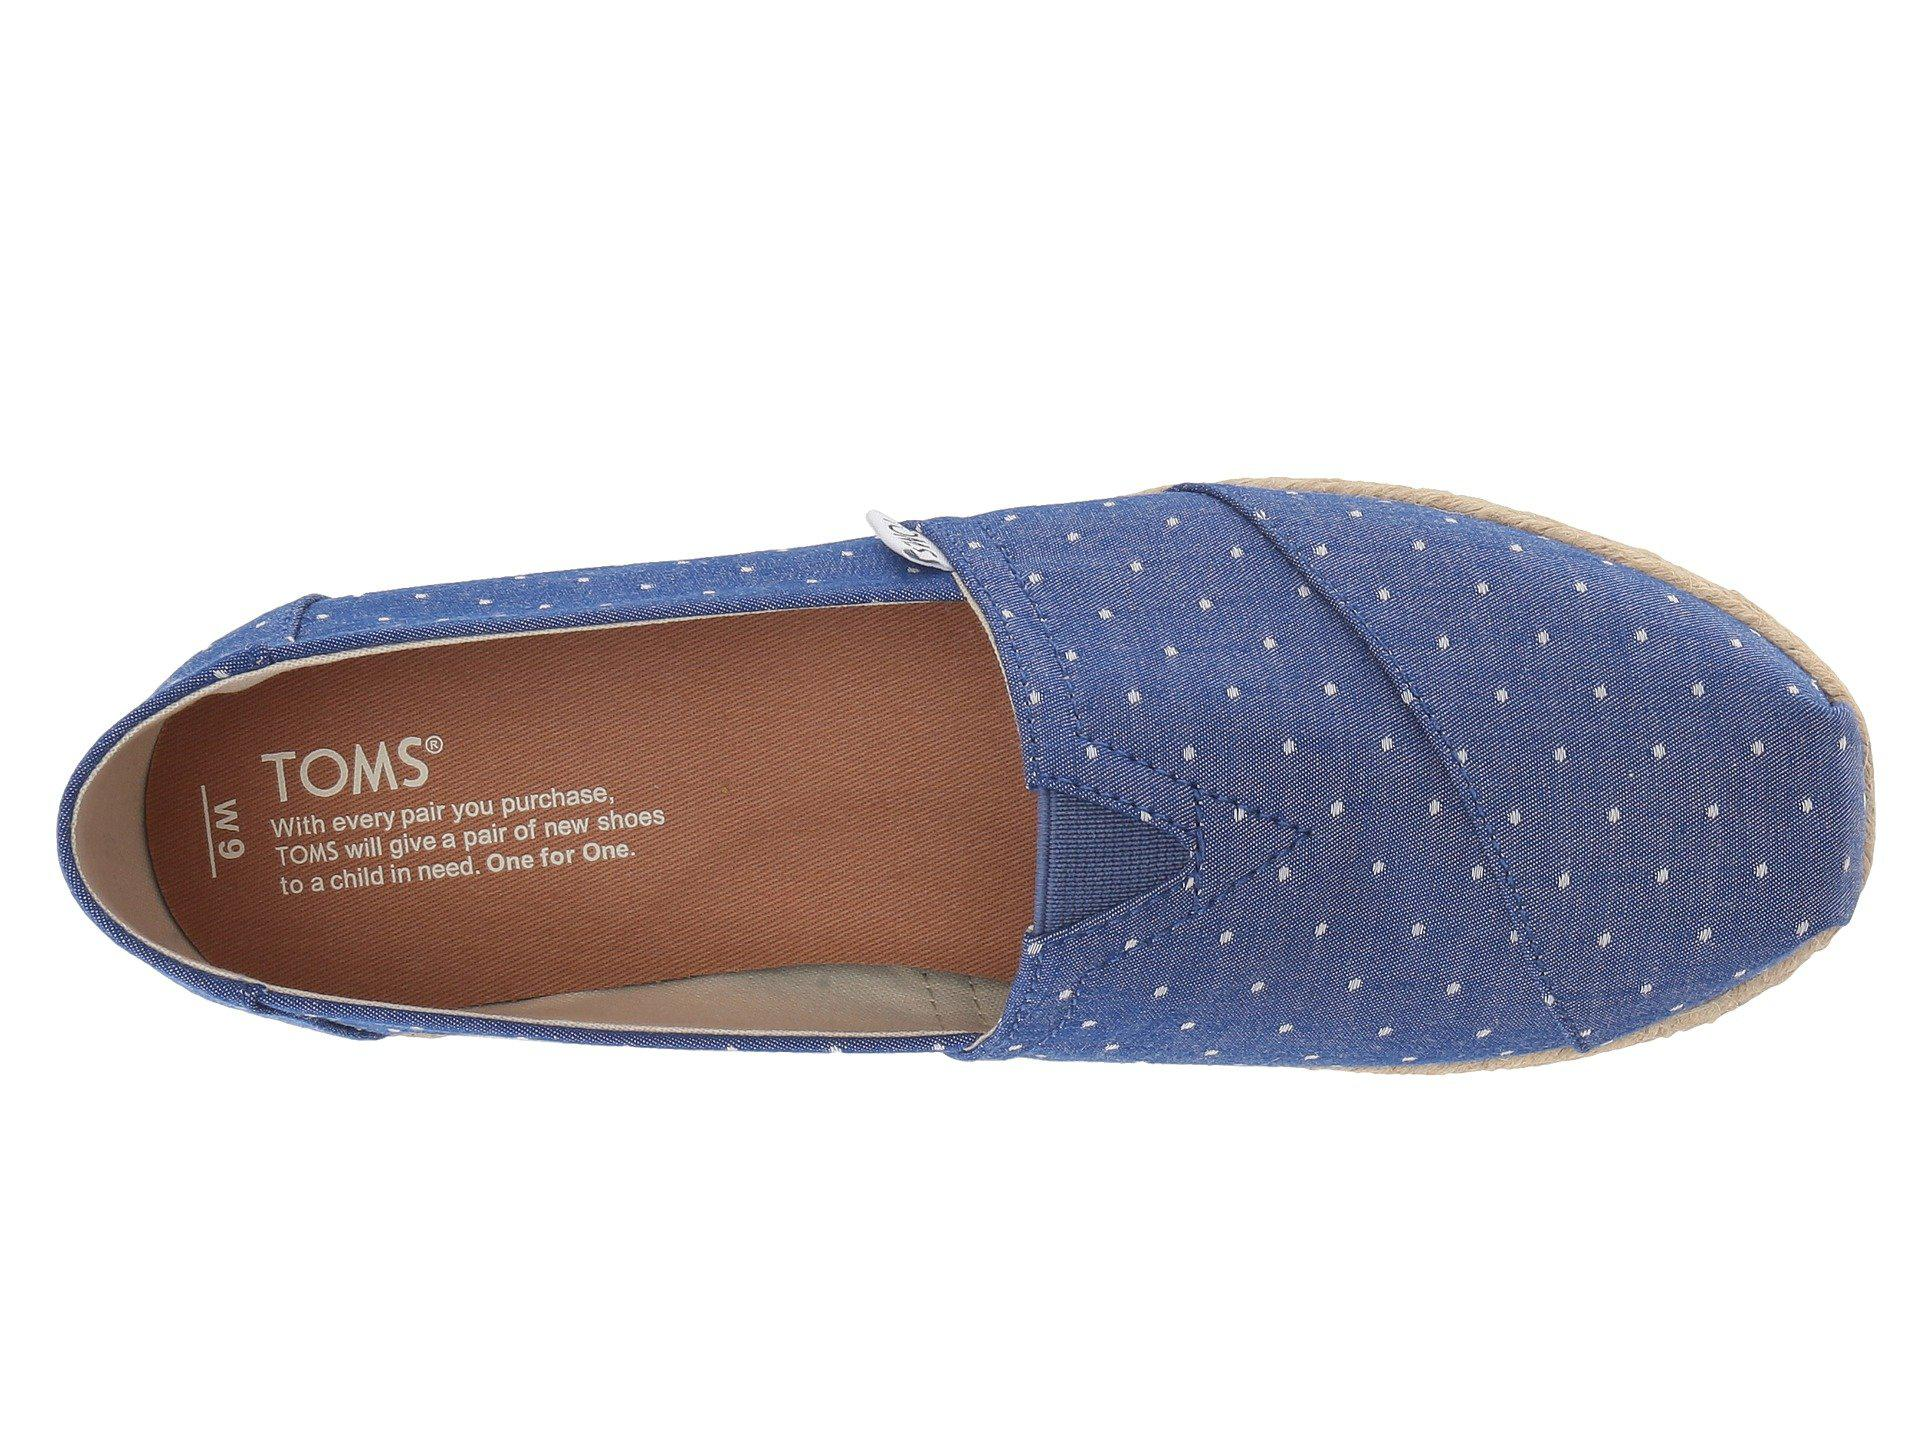 73cfce5fccac TOMS - Blue Seasonal Classics (black Dot Chambray) Women s Slip On Shoes -  Lyst. View fullscreen